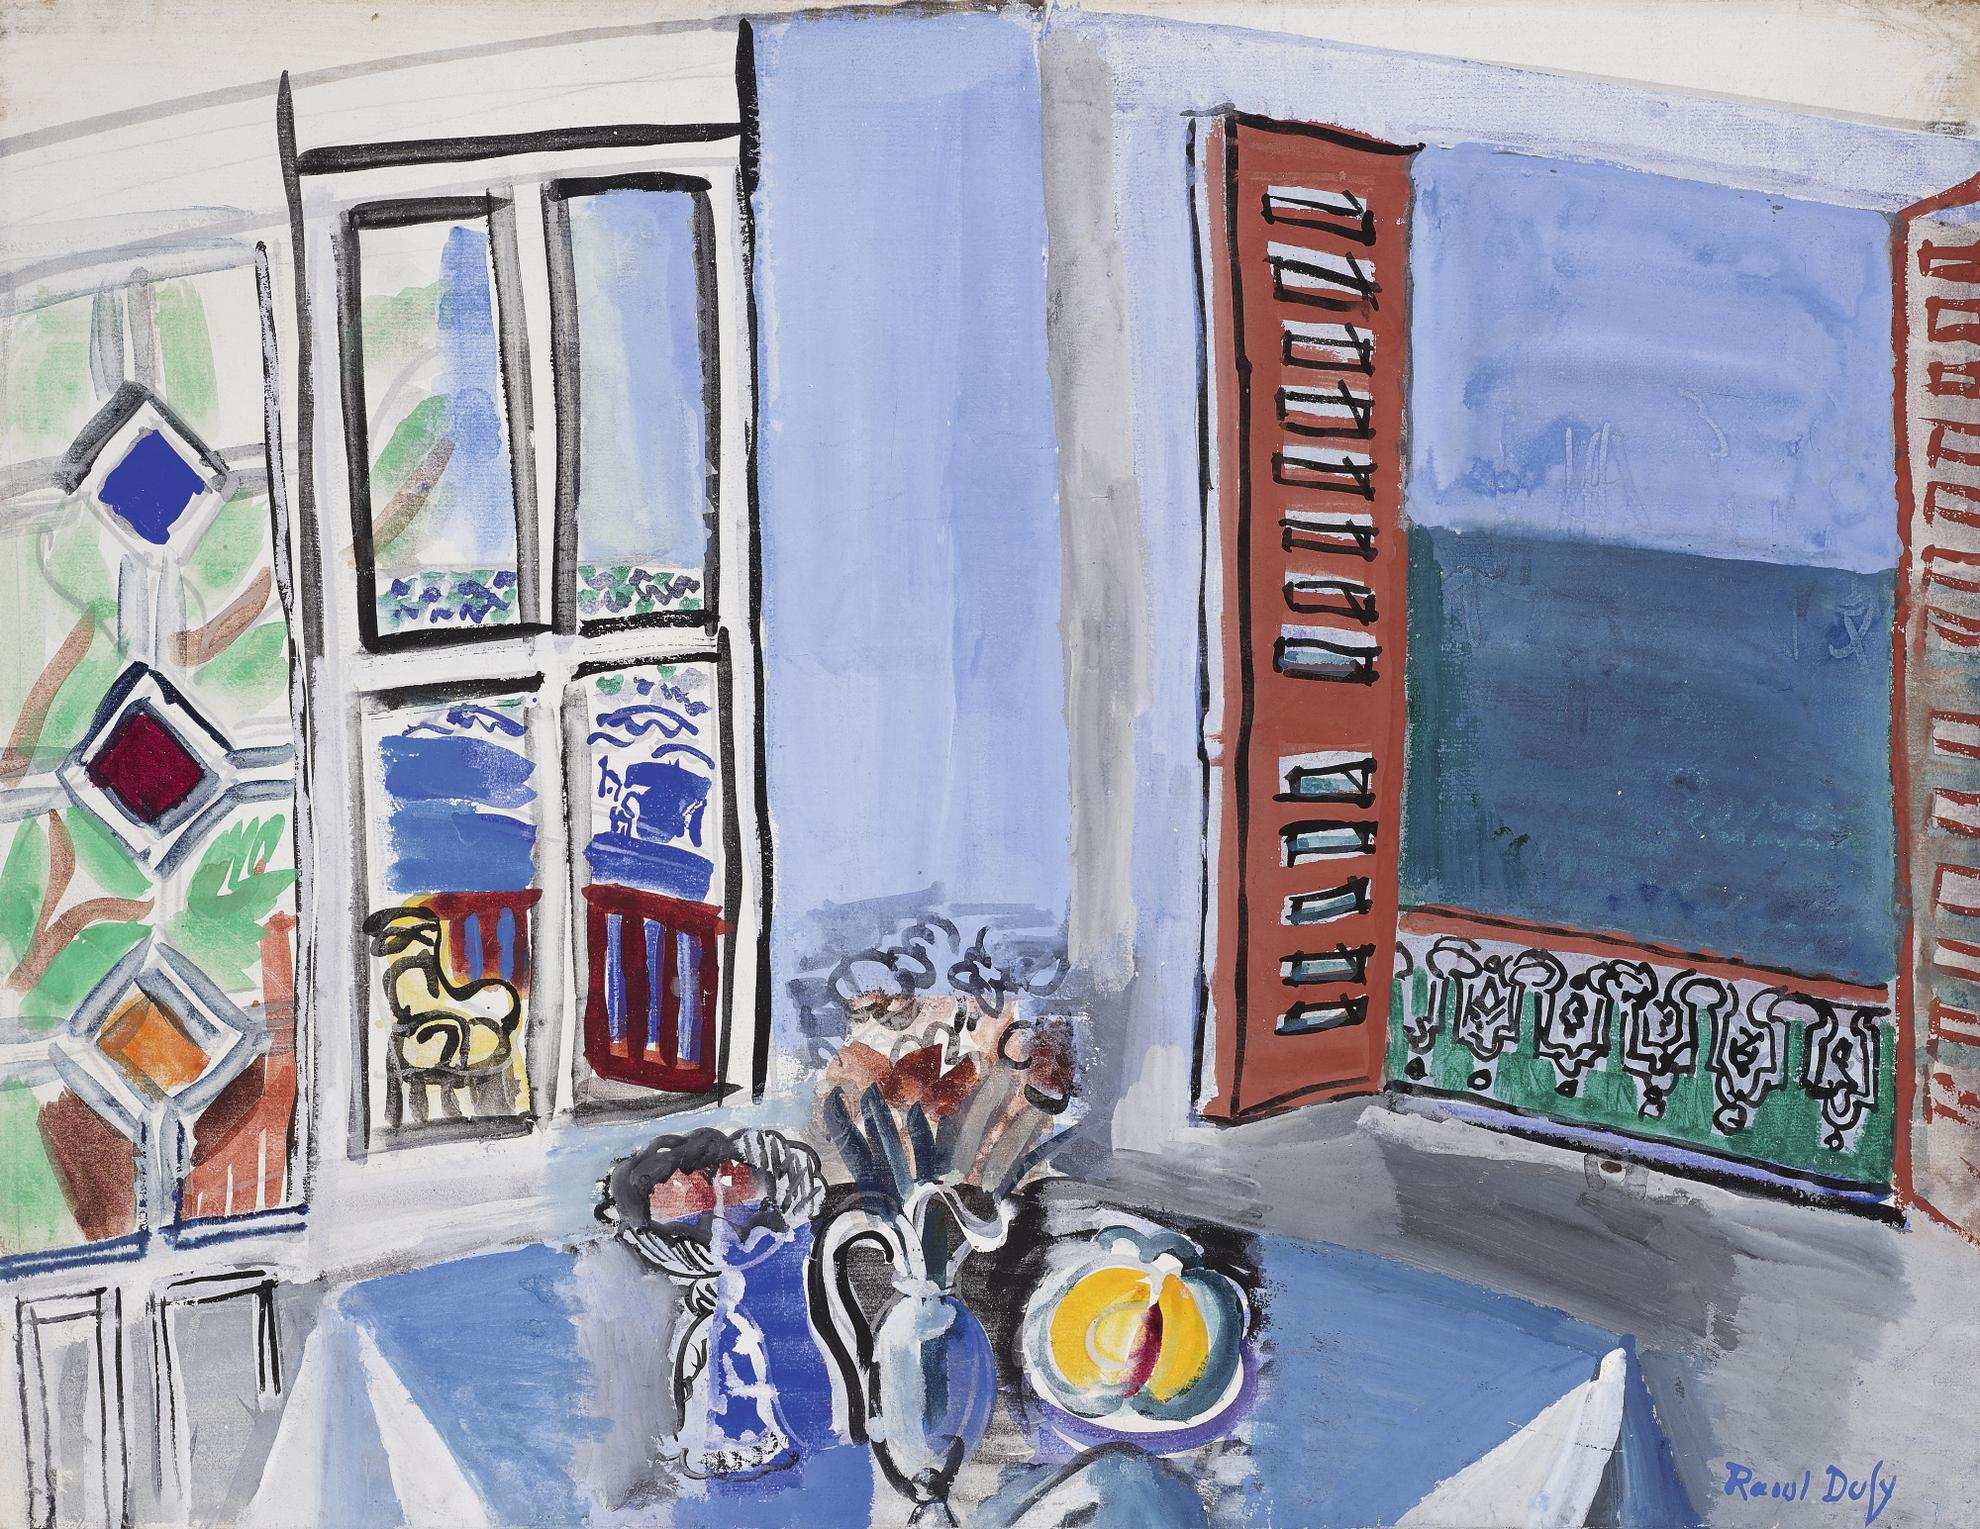 Raoul Dufy-Latelier De Lartiste Au Havre-1929